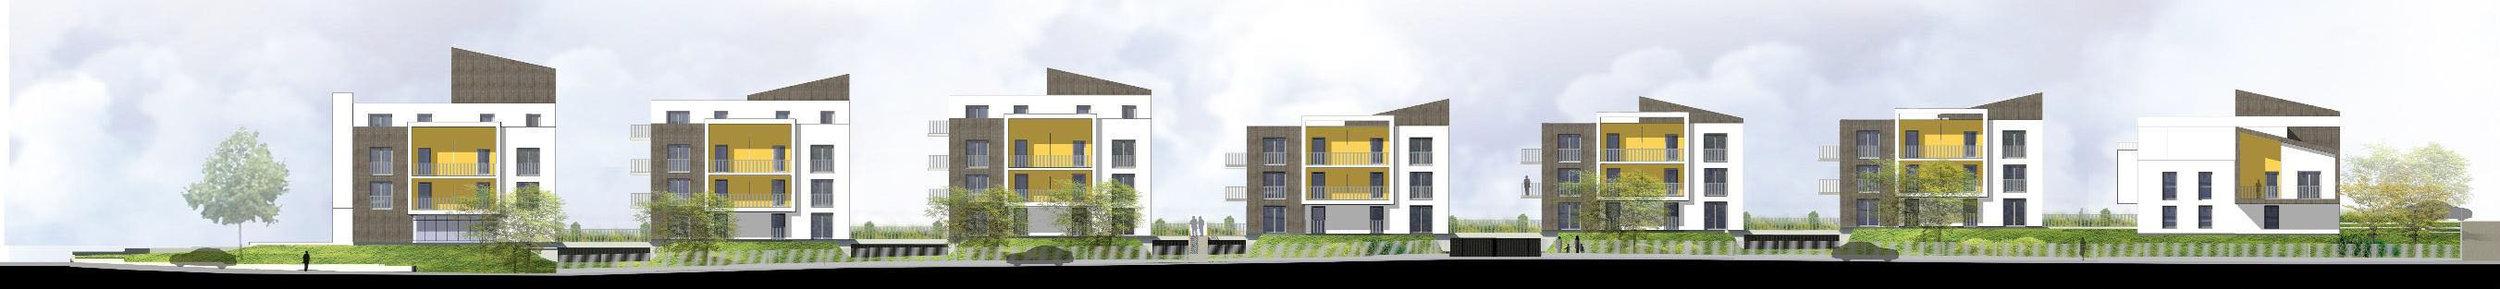 troyes_collective_housing_public_outdoor_design_christophe_gautrand_landscape_6.jpg